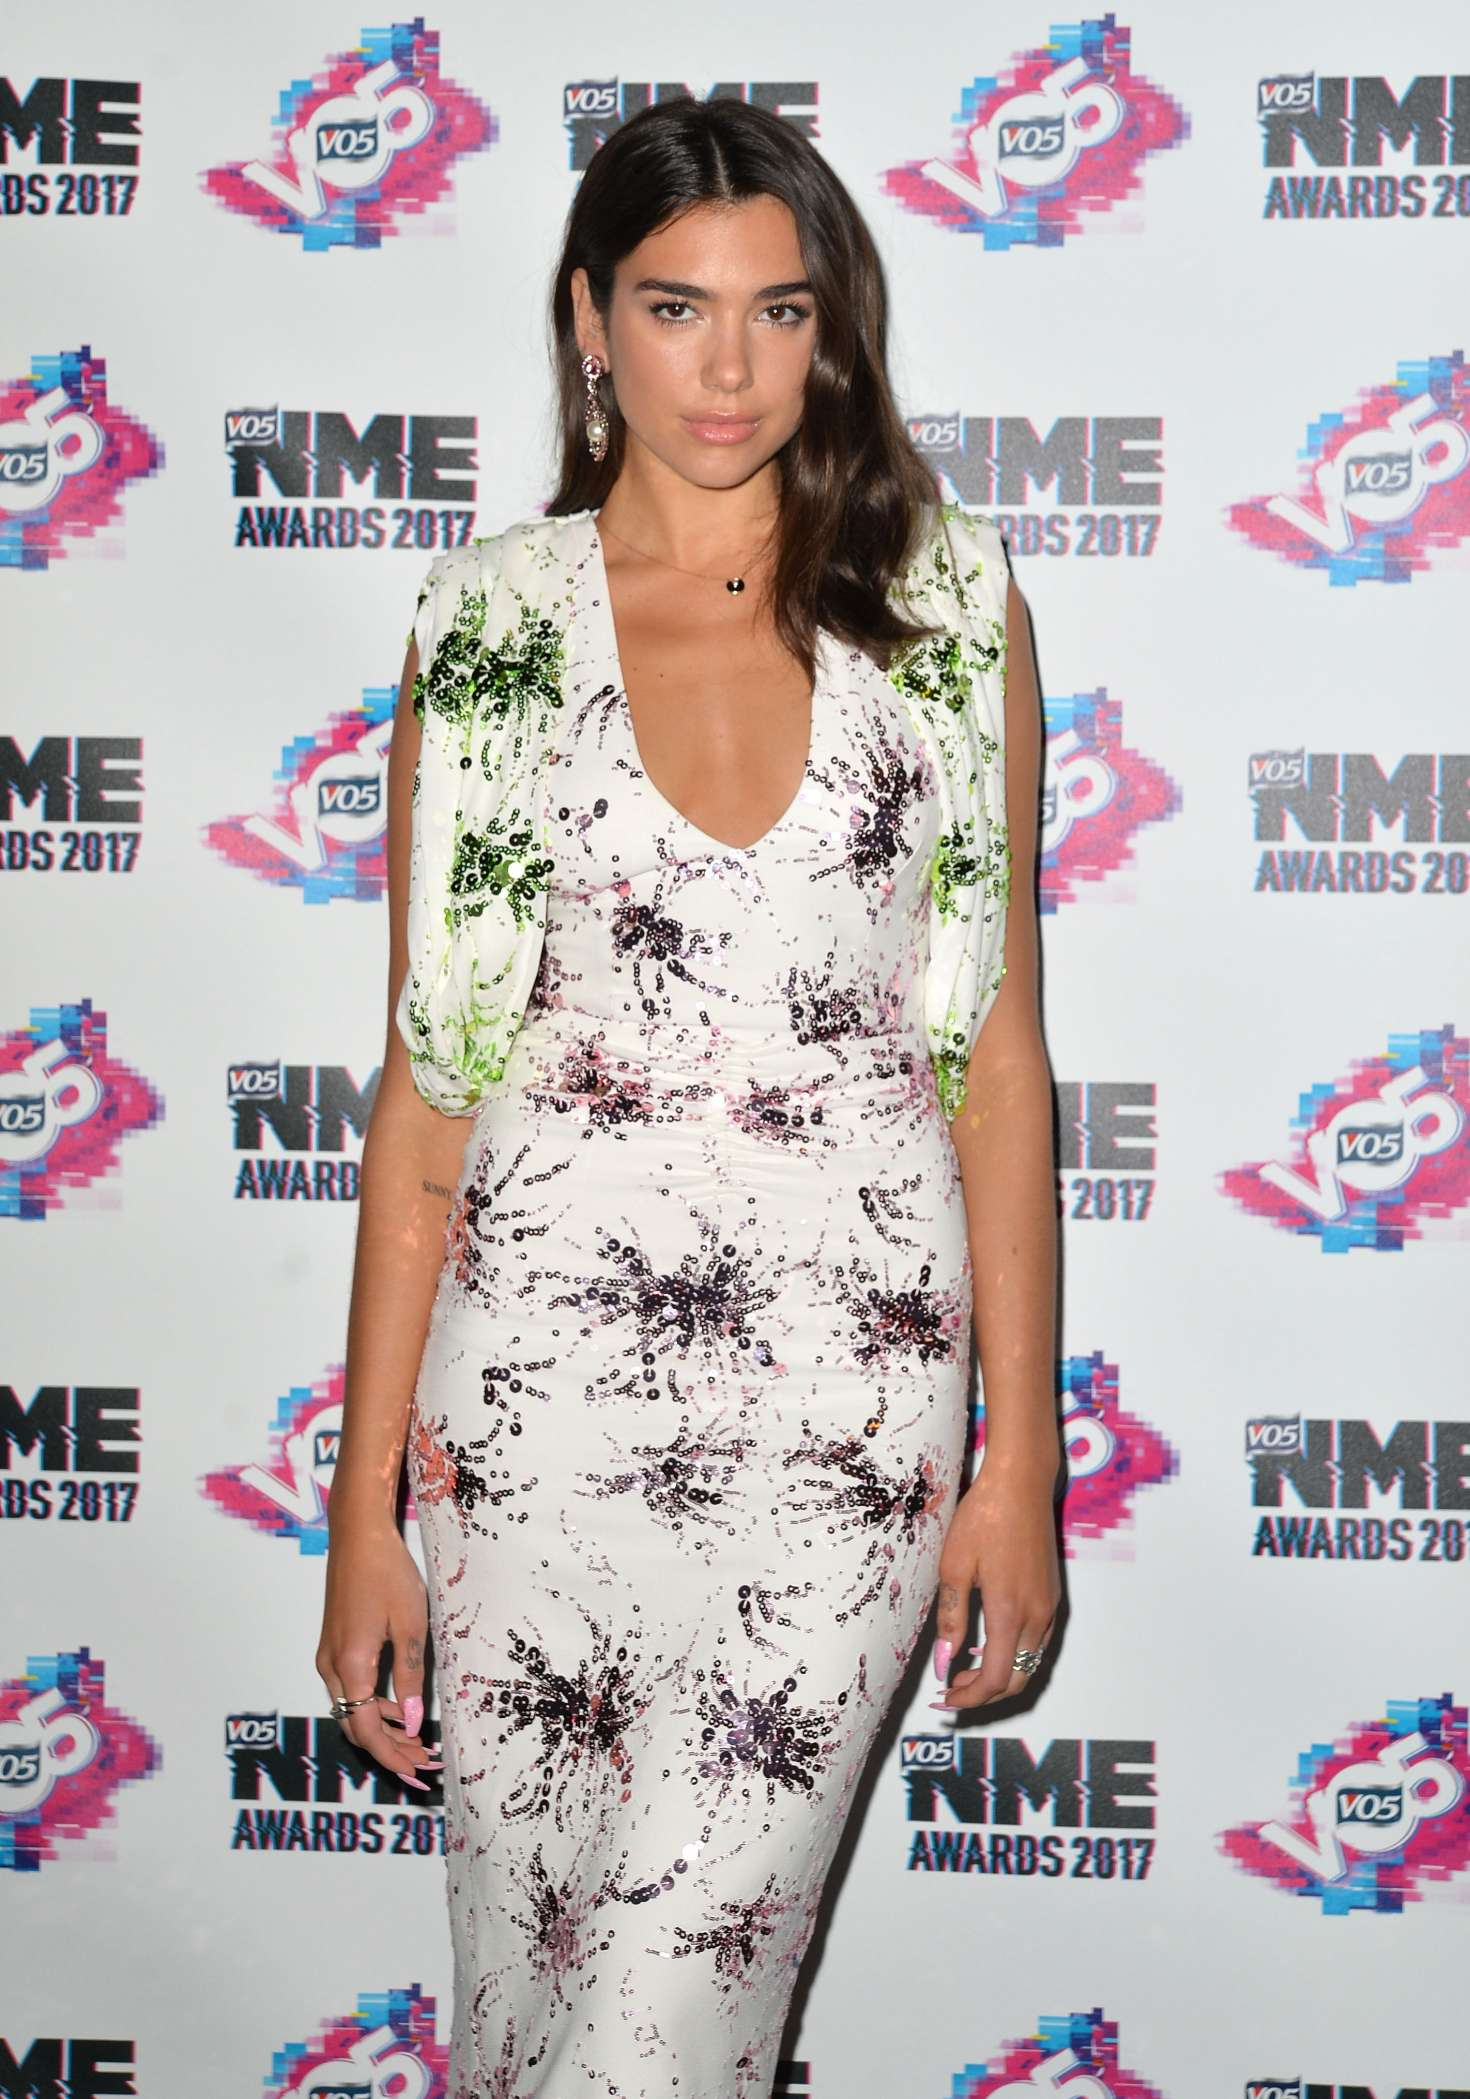 Dua Lipa 2017 Nme Awards In London Gotceleb